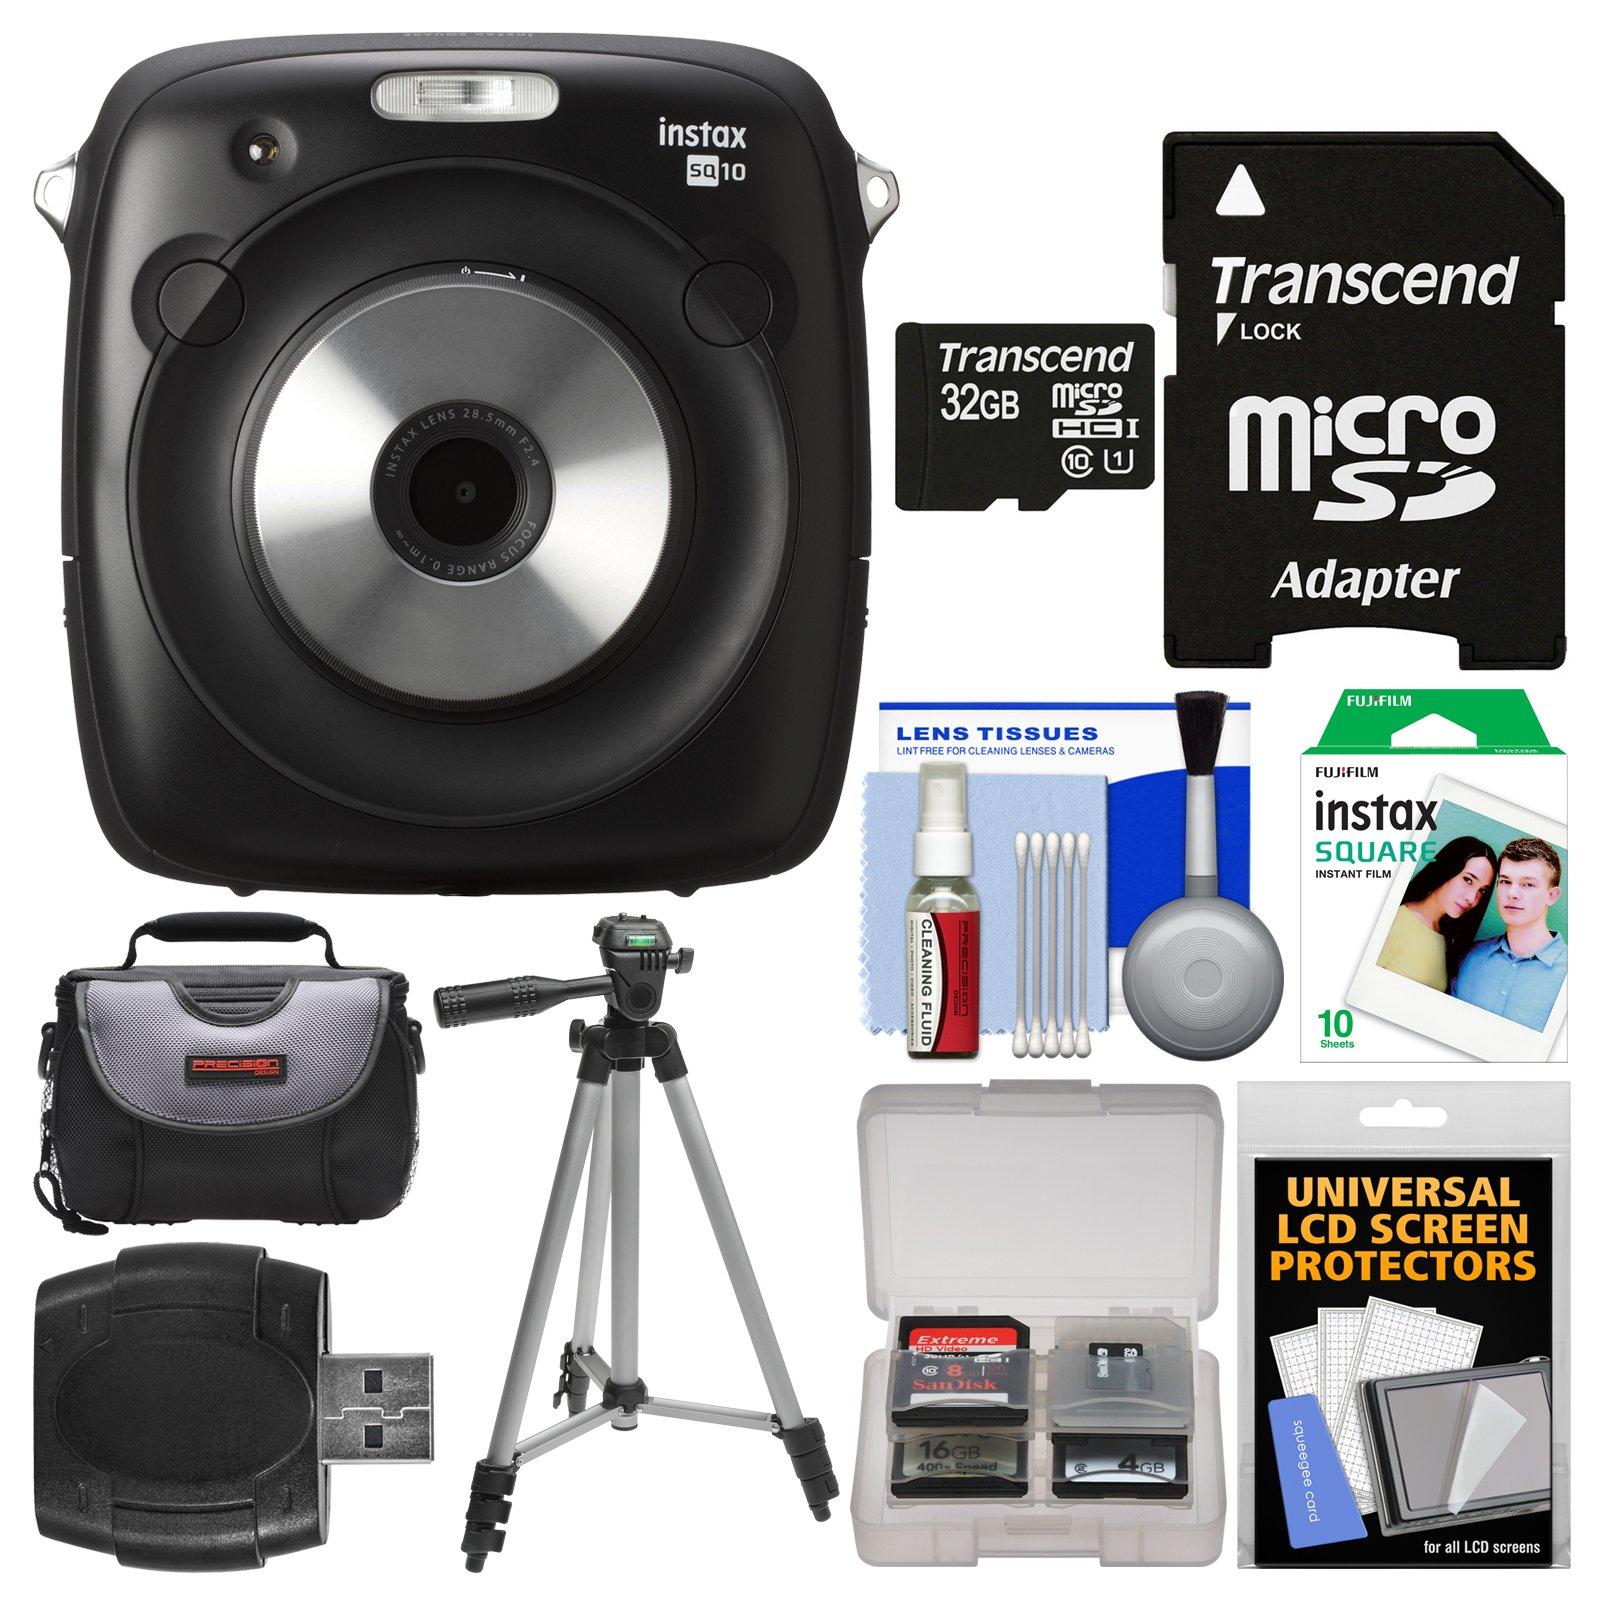 Fujifilm Instax Square SQ10 Hybrid Instant Film & Digital Camera with 32GB Card + 10 Color Prints + Case + Tripod + Kit